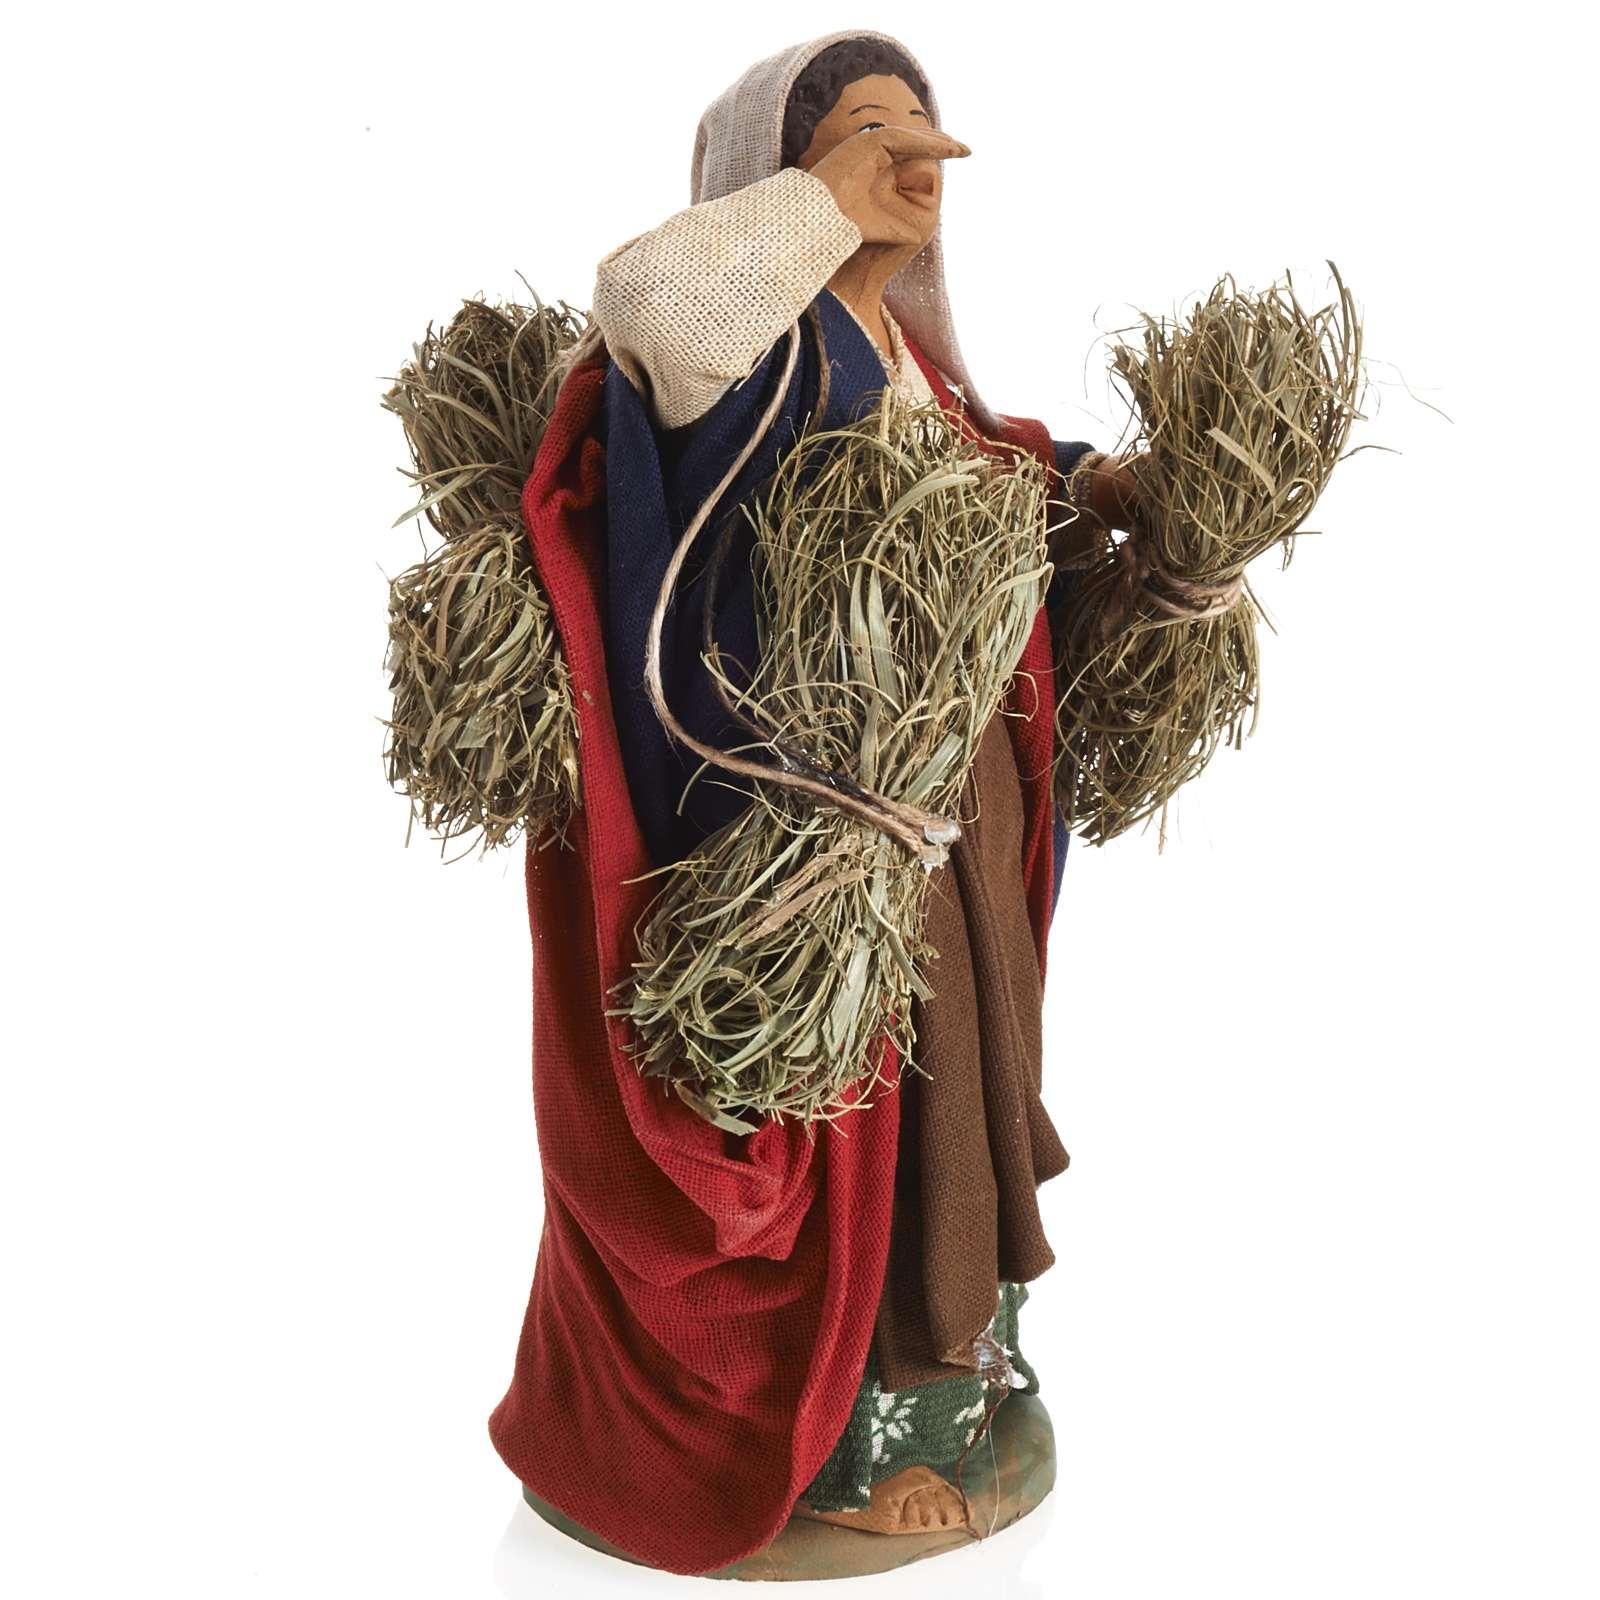 Neapolitan Nativity figurine, female farmer with bundles, 14 cm 4